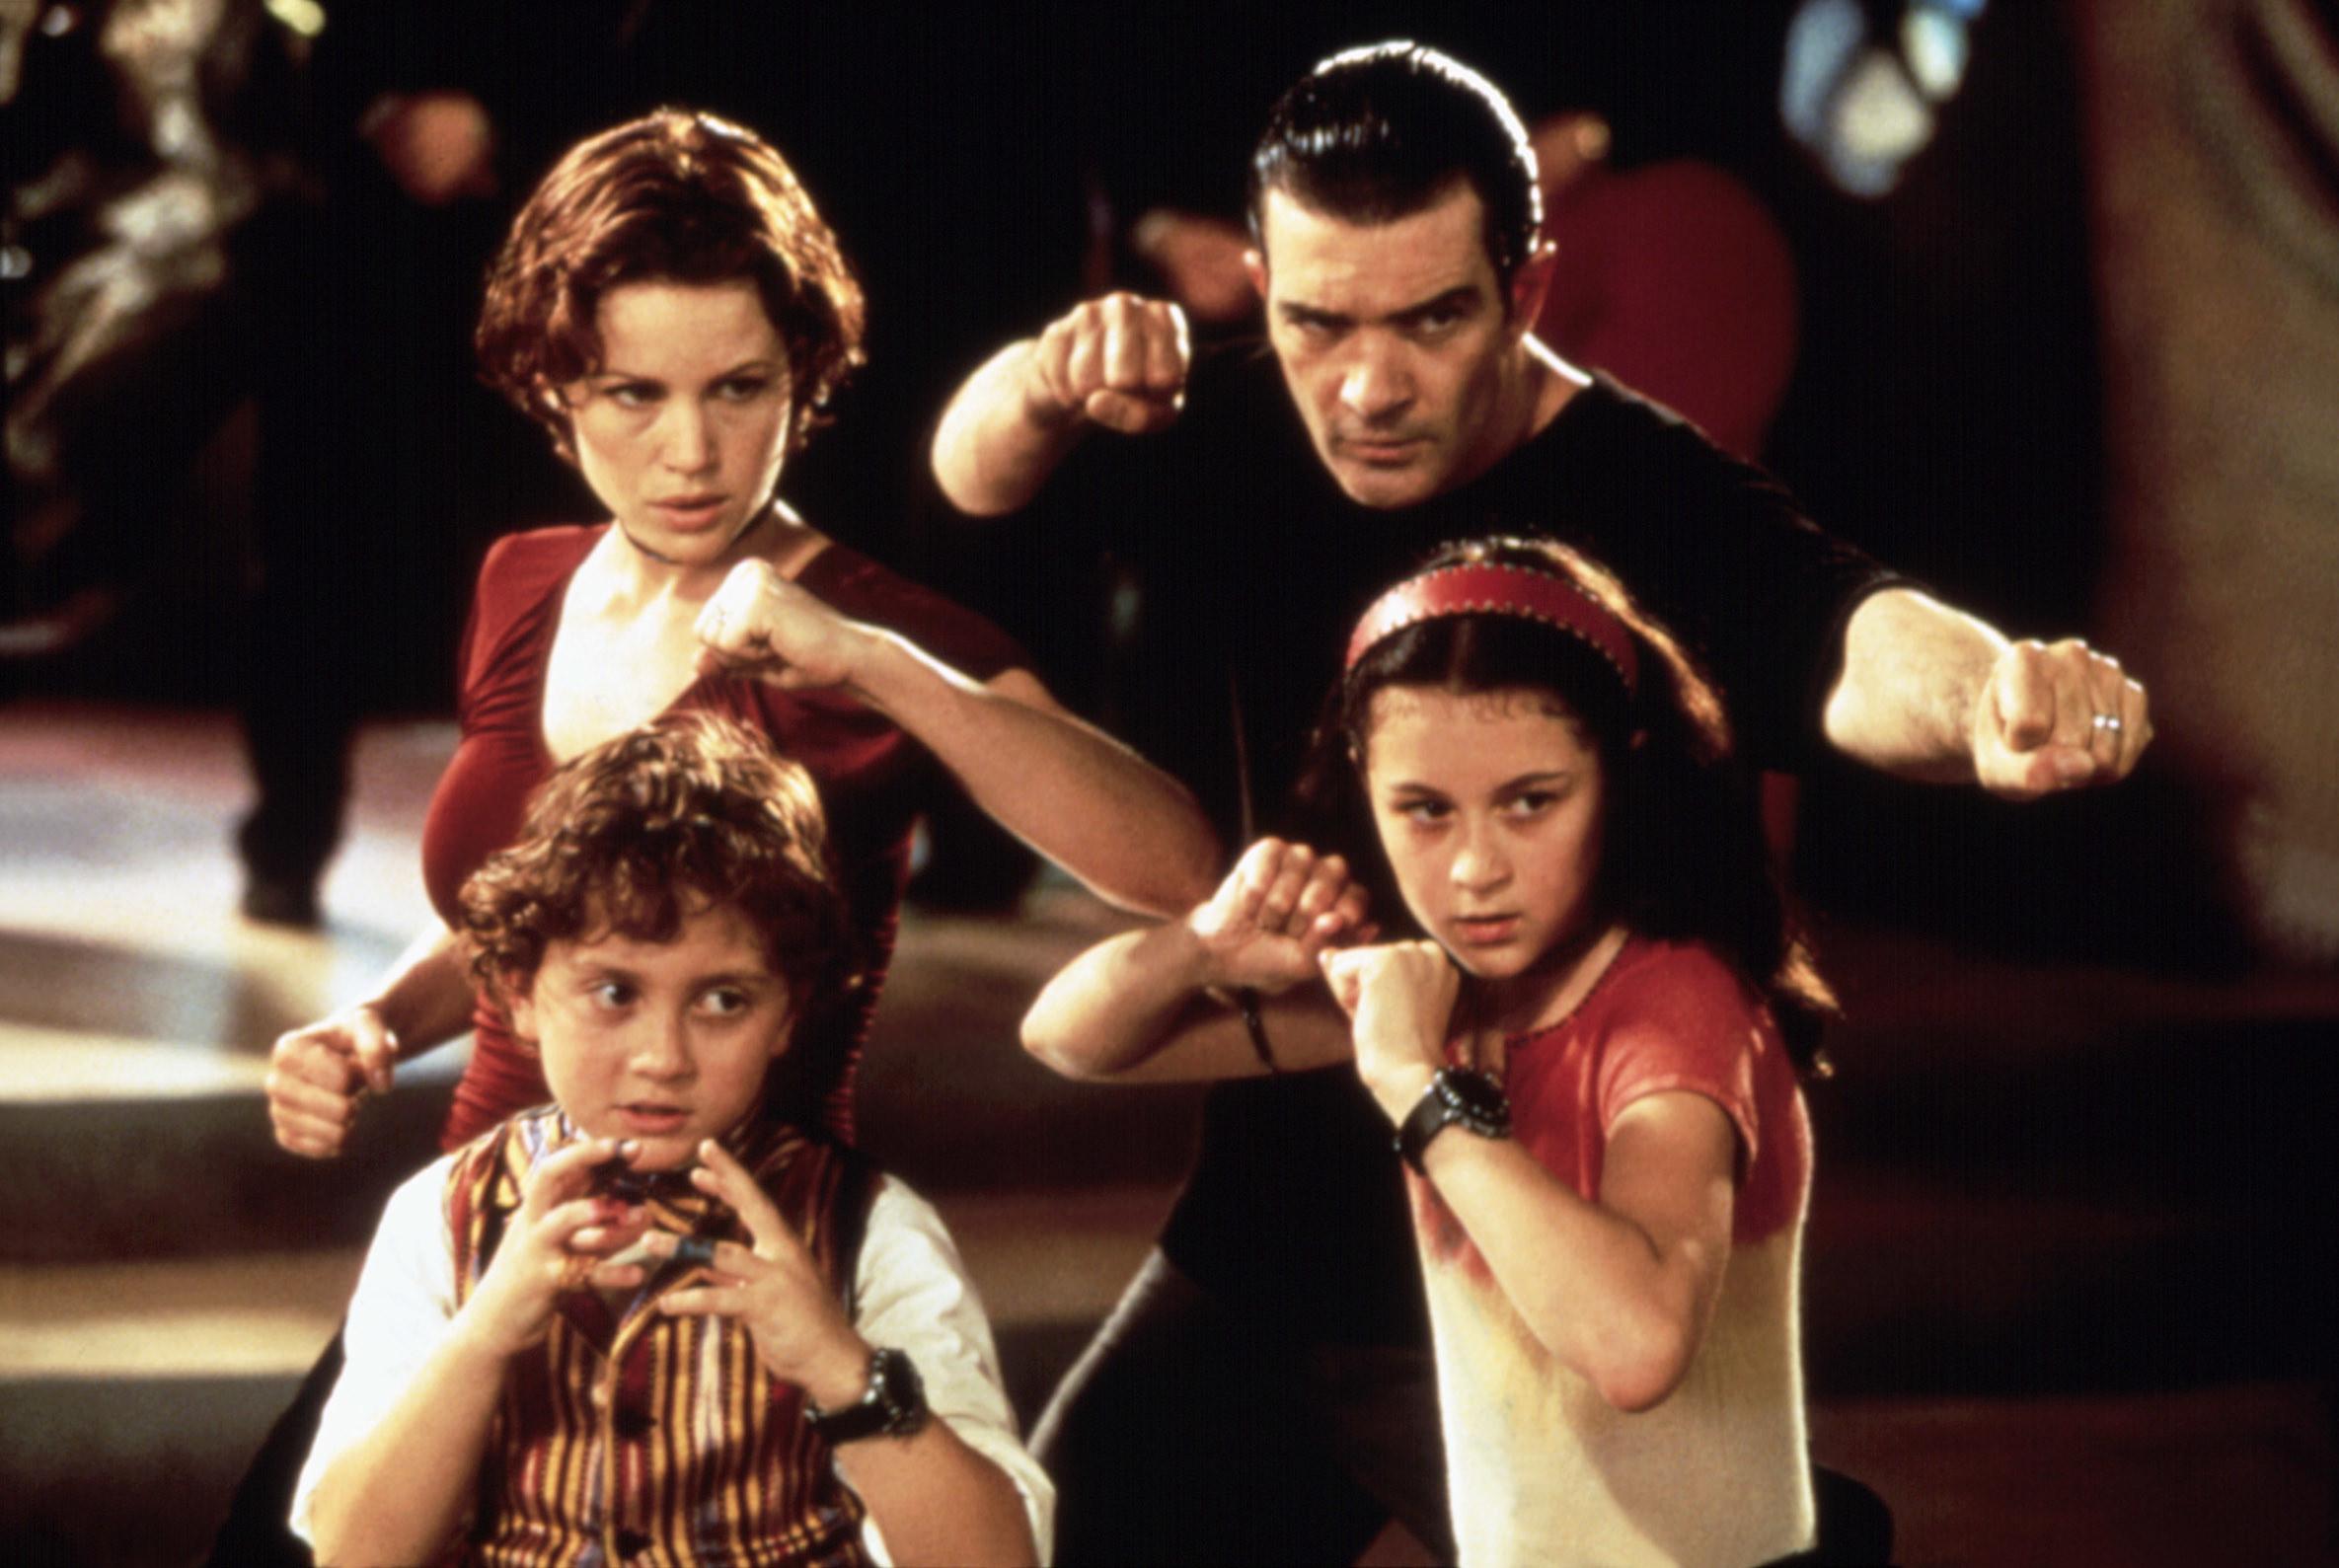 Carla Gugino,Antonio Banderas,Daryl Sabara, and Alexa Vega put their hands in fists, ready to fight as Ingrid,Gregorio, Juni, and Carmen